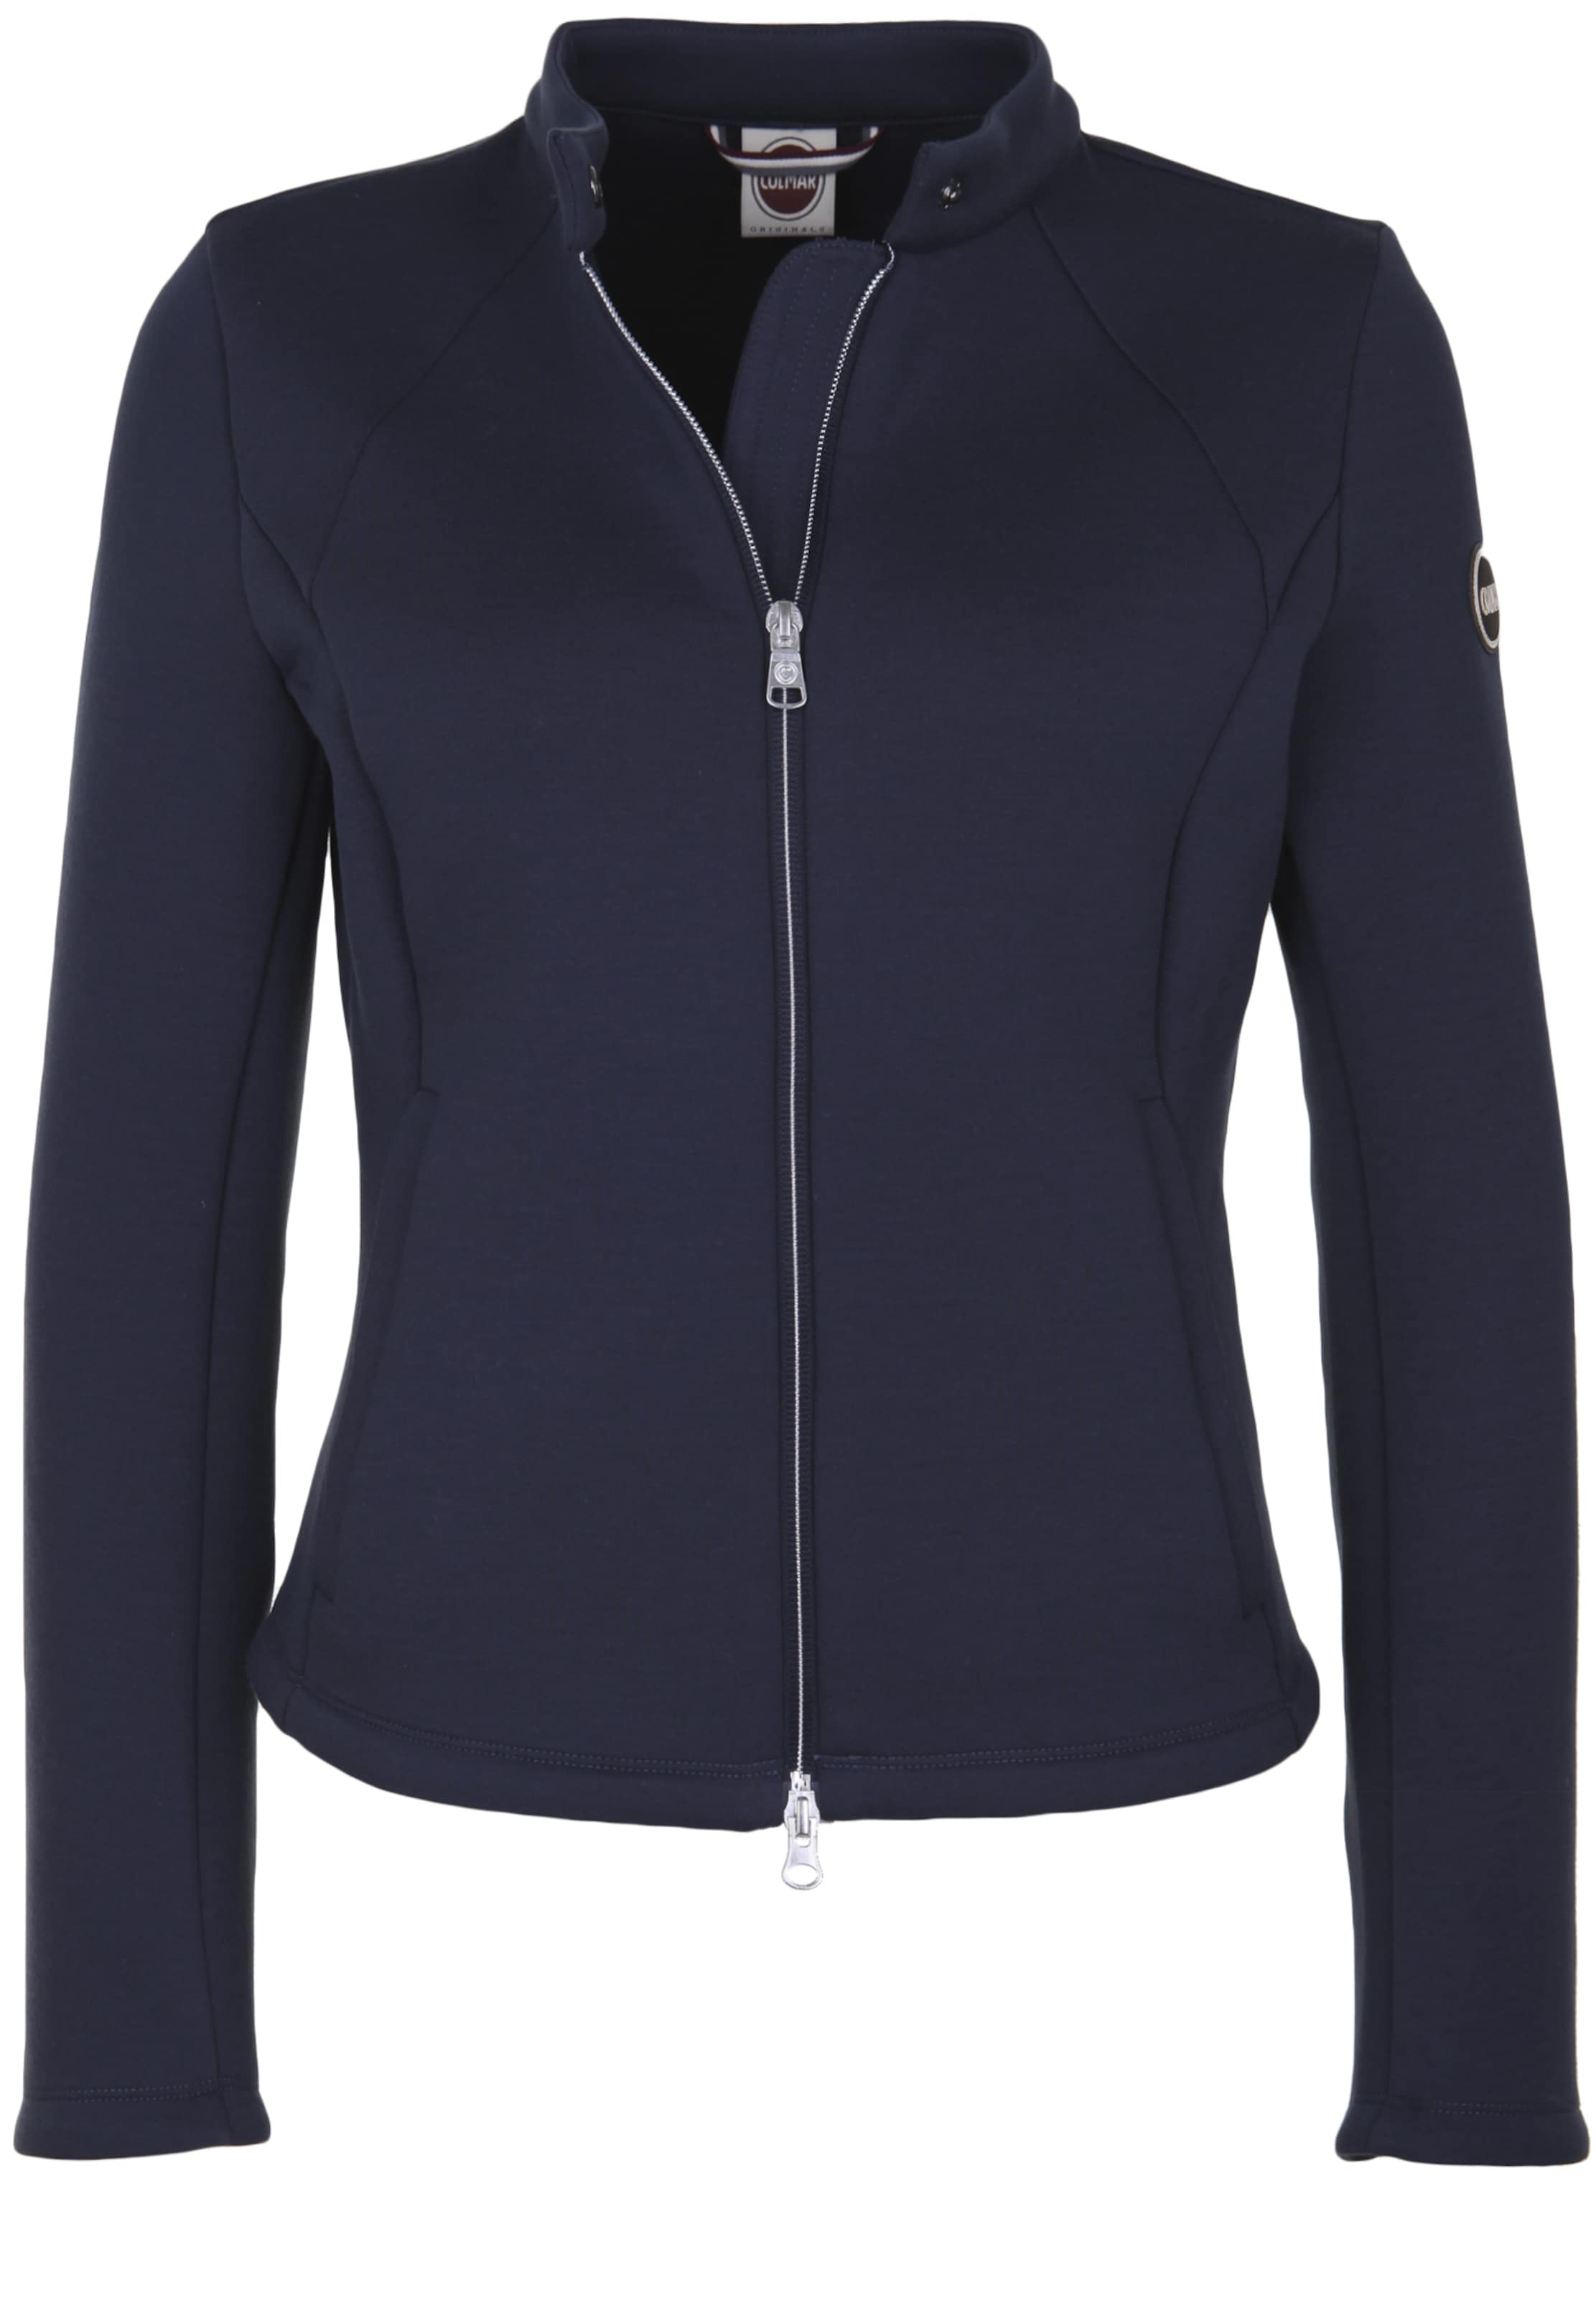 Colmar Damen Übergangsjacke RUNWAY blau | 08300982927541